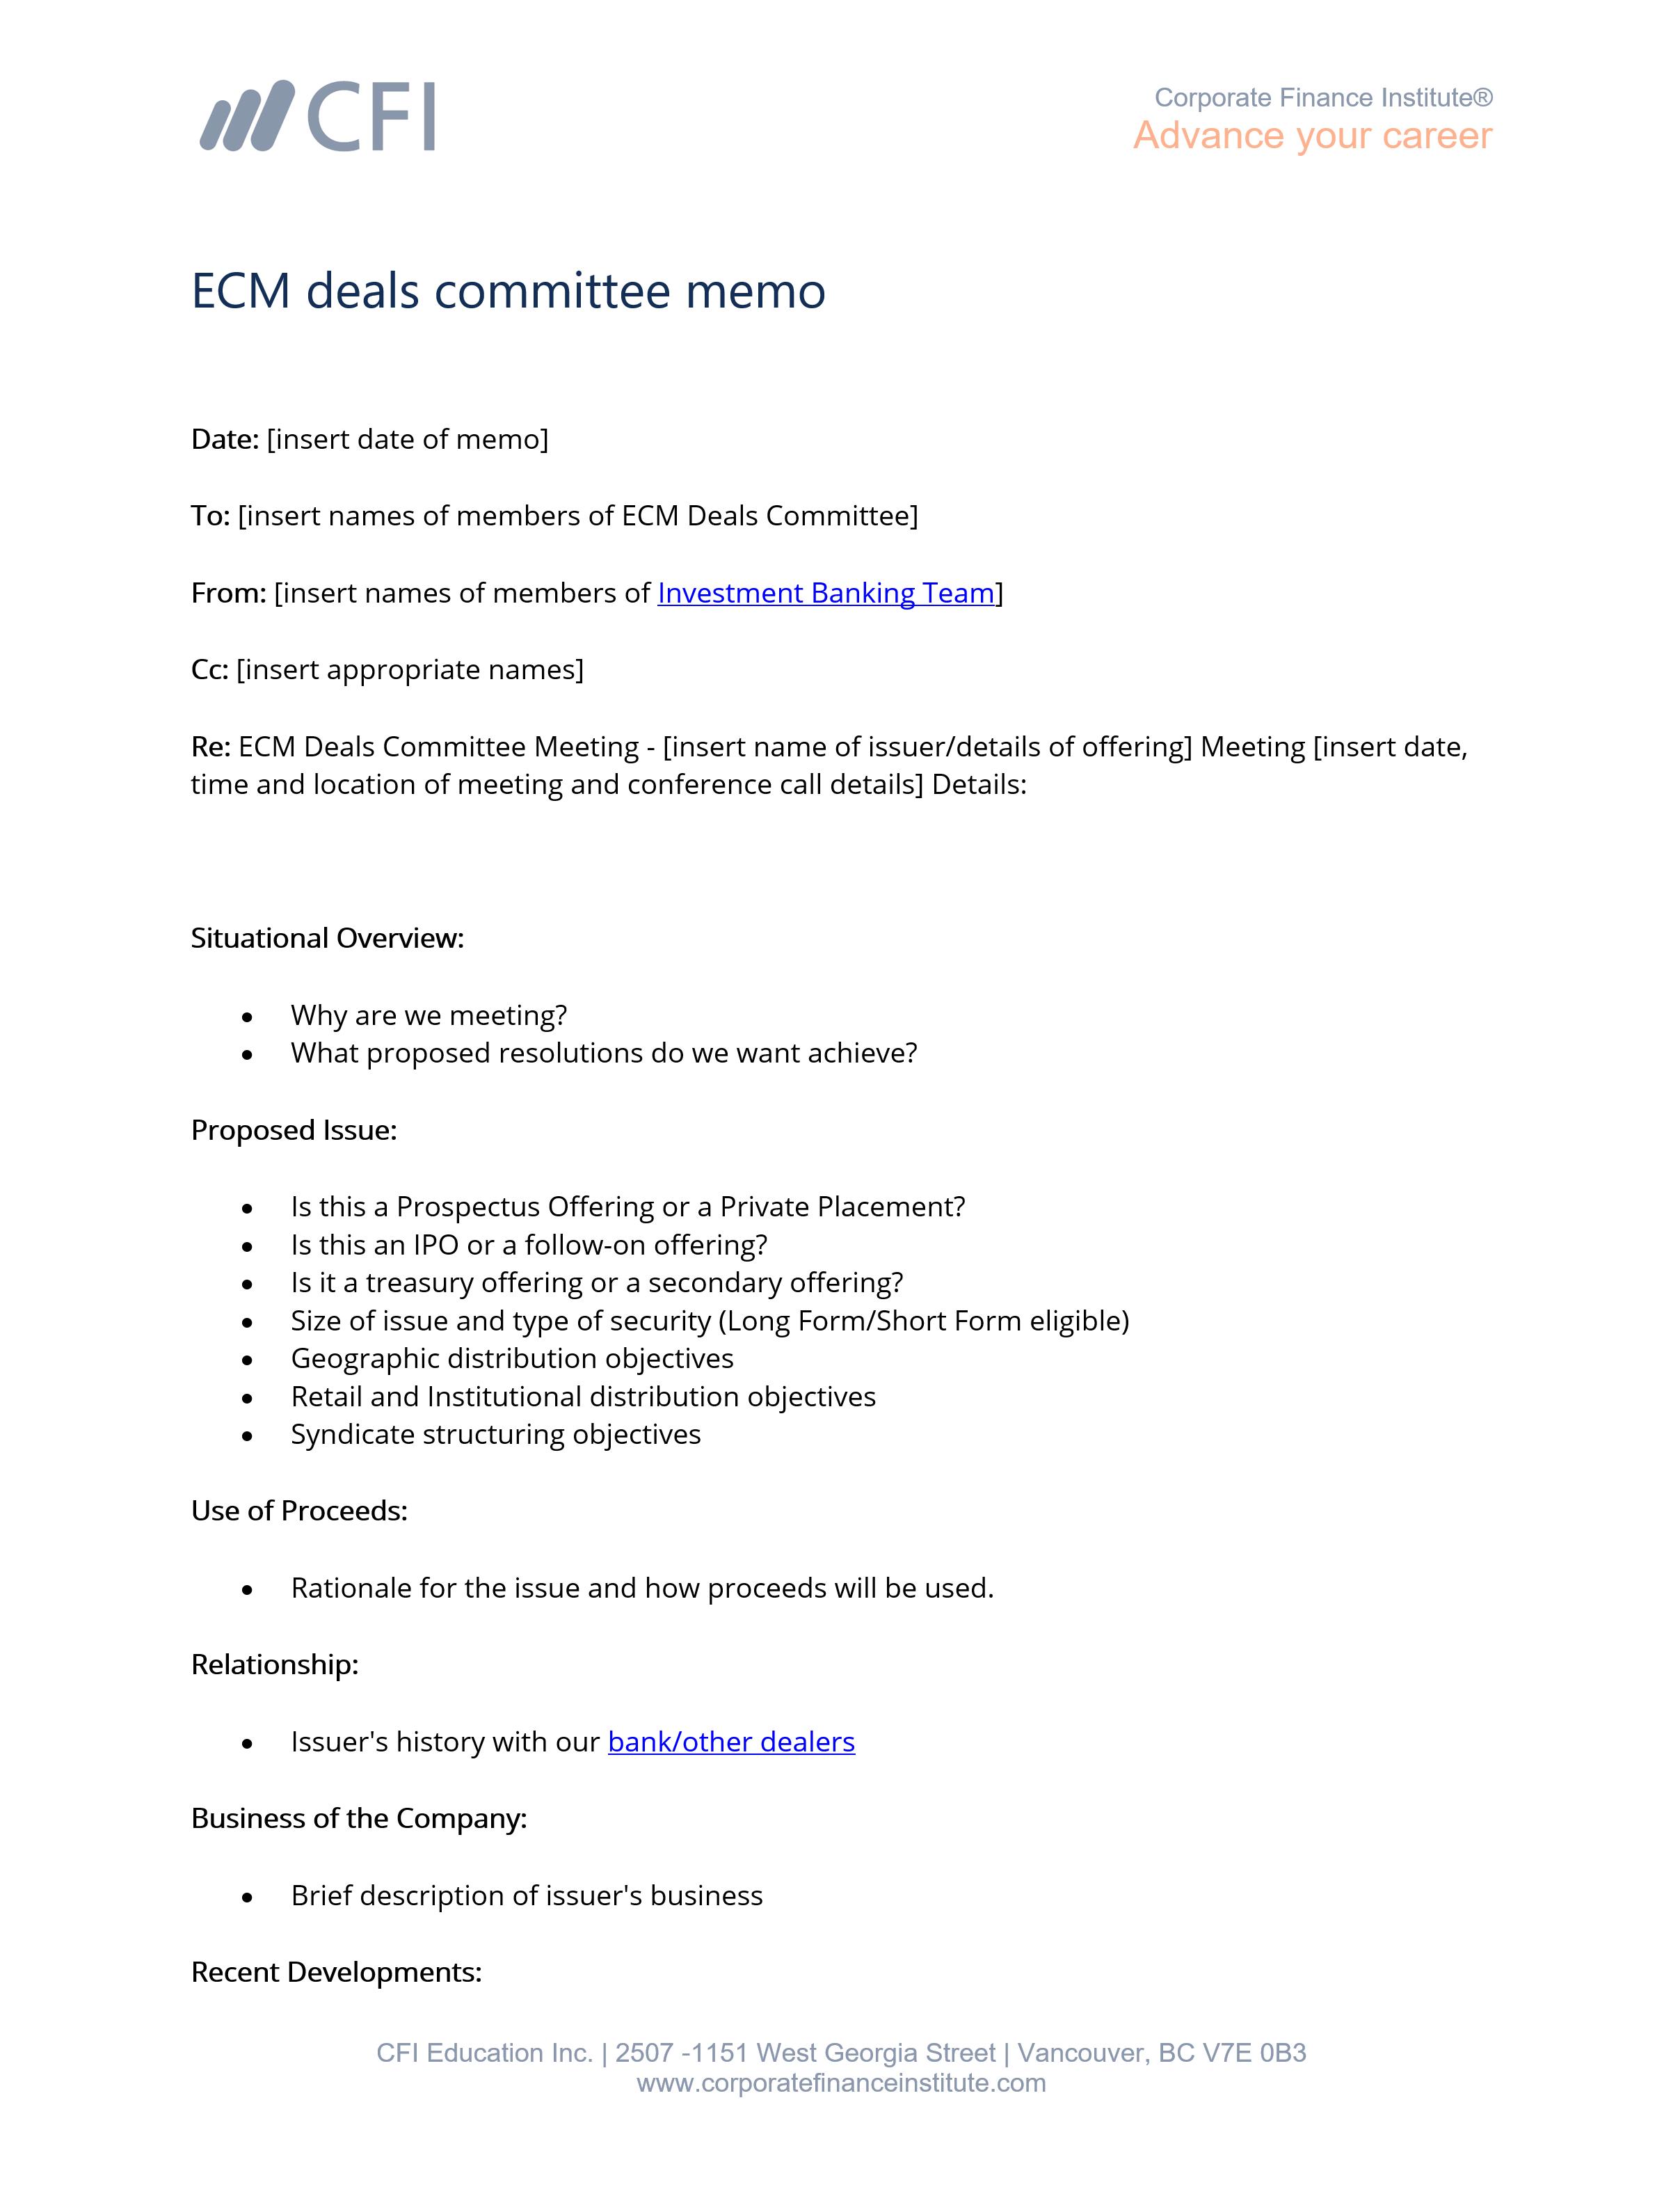 Memorandum Sample Template from corporatefinanceinstitute.com